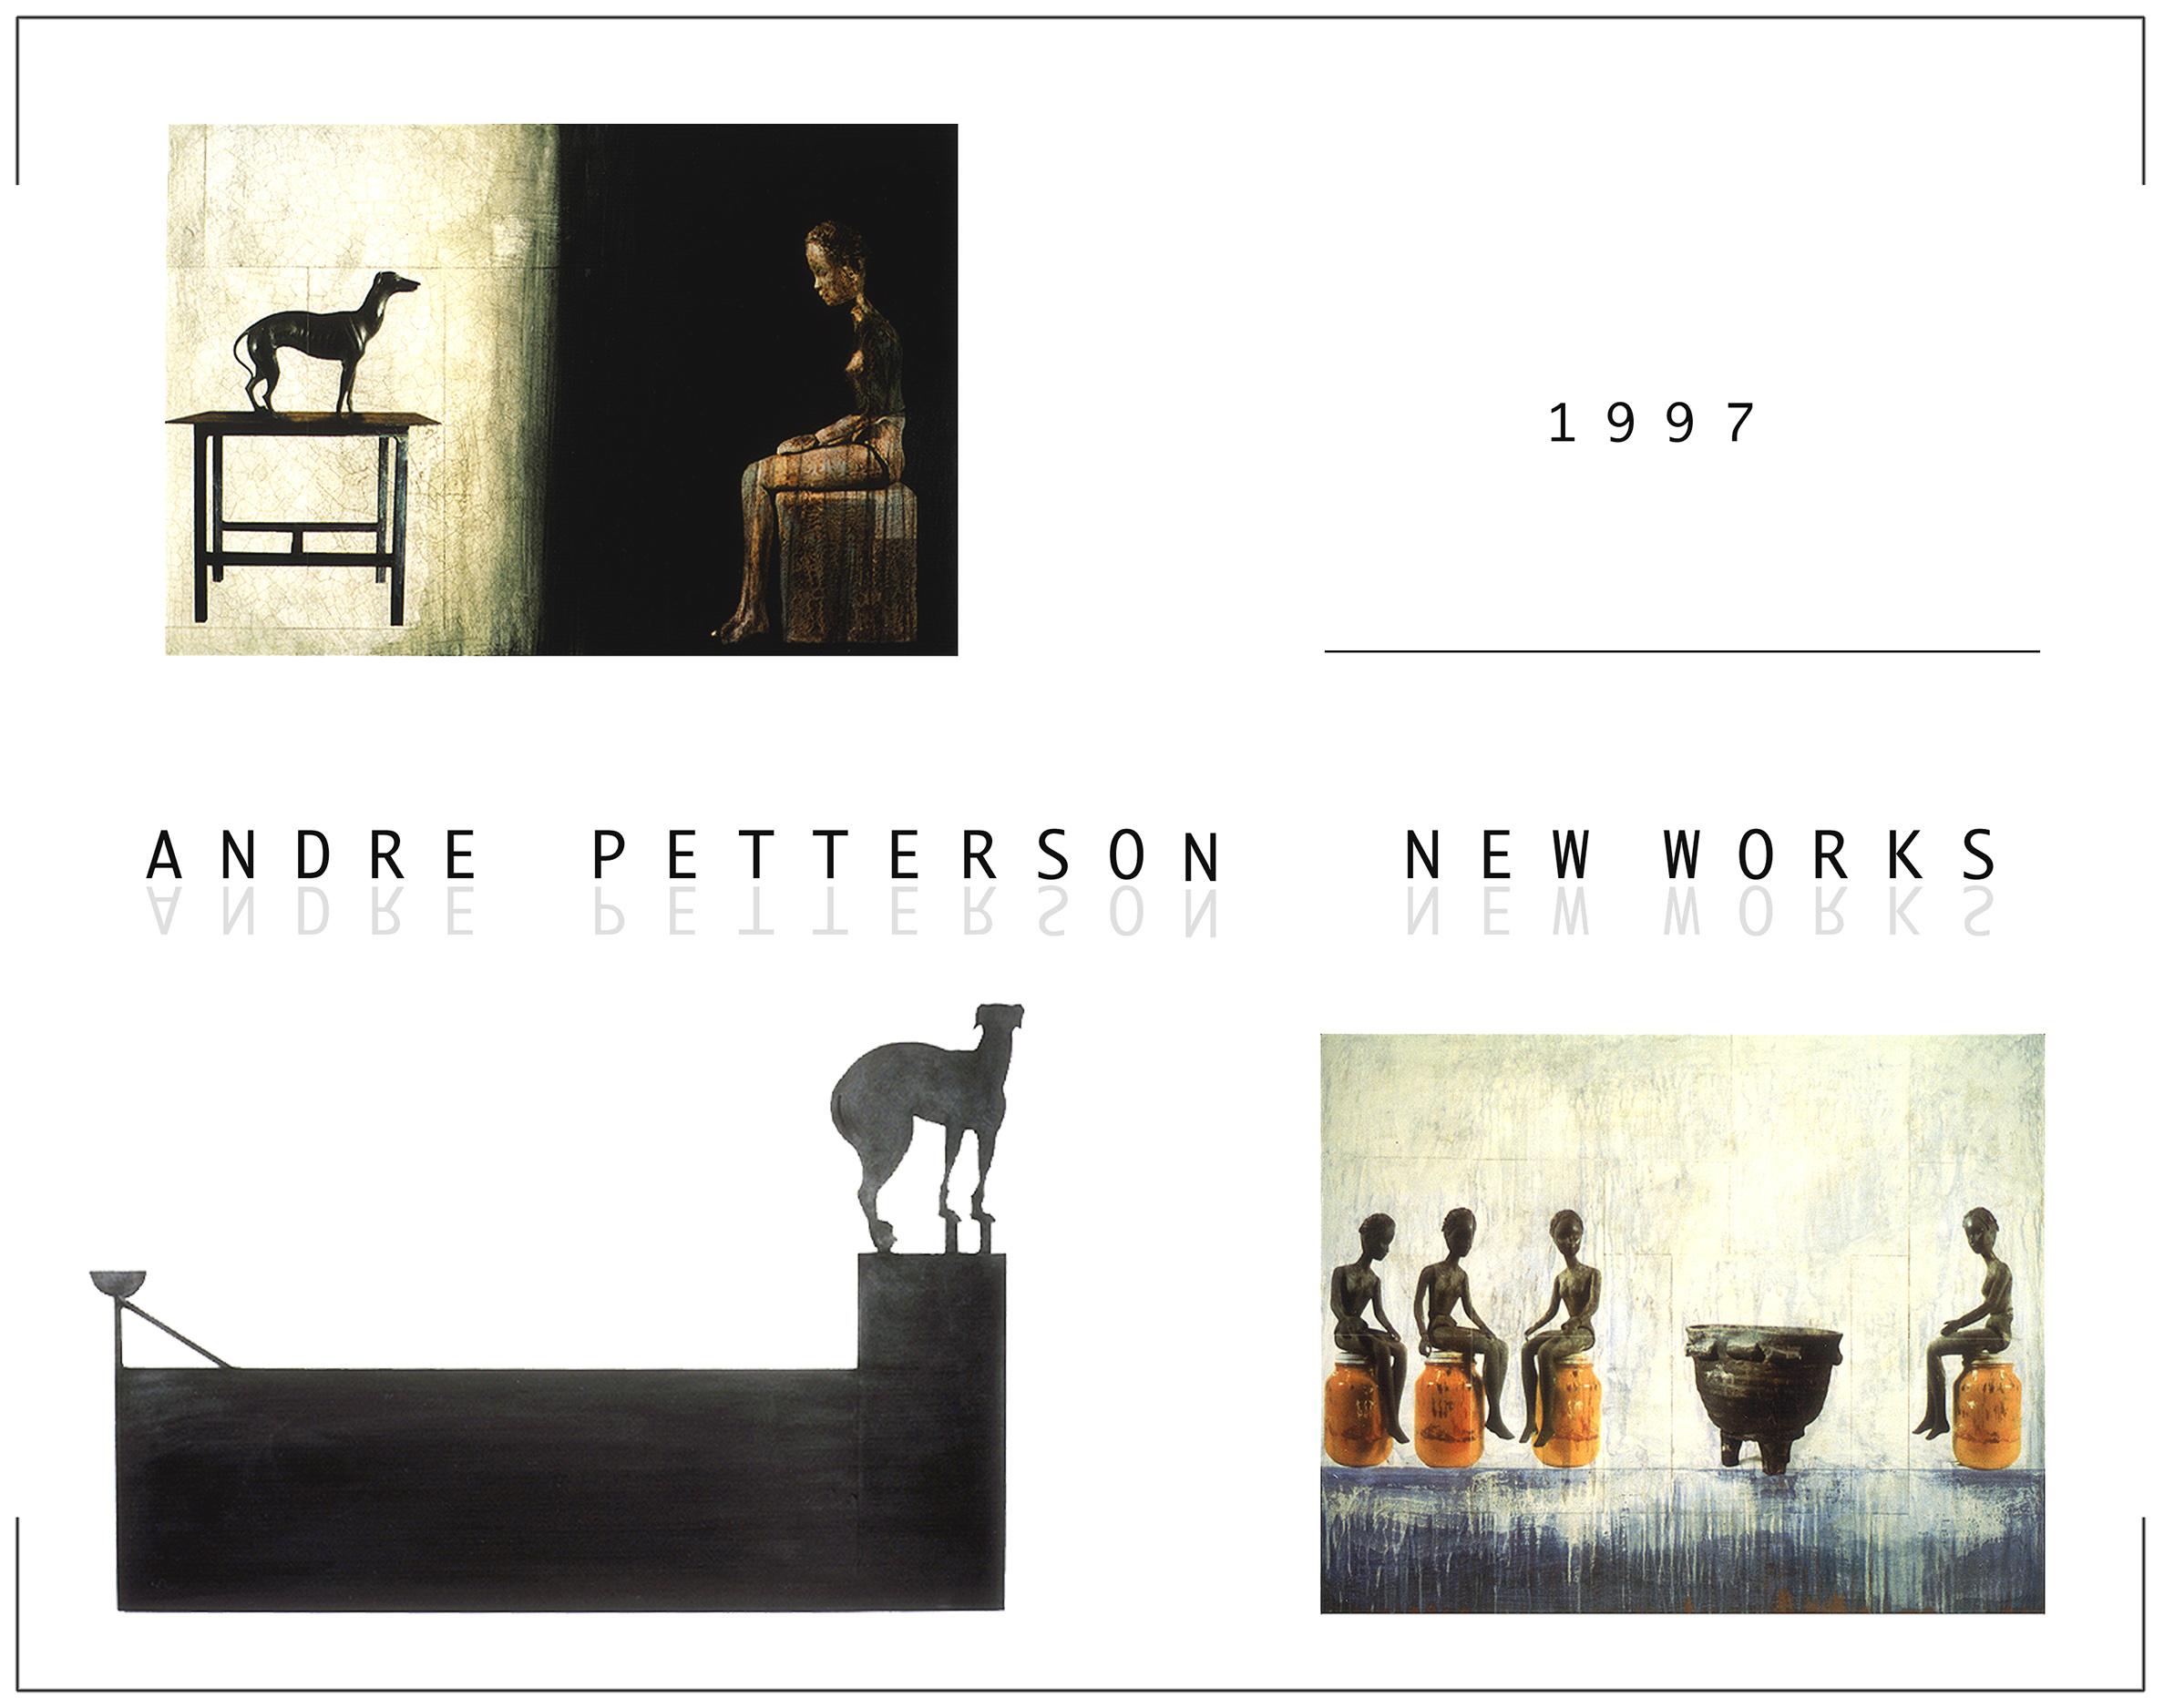 new works 3  1997.jpg